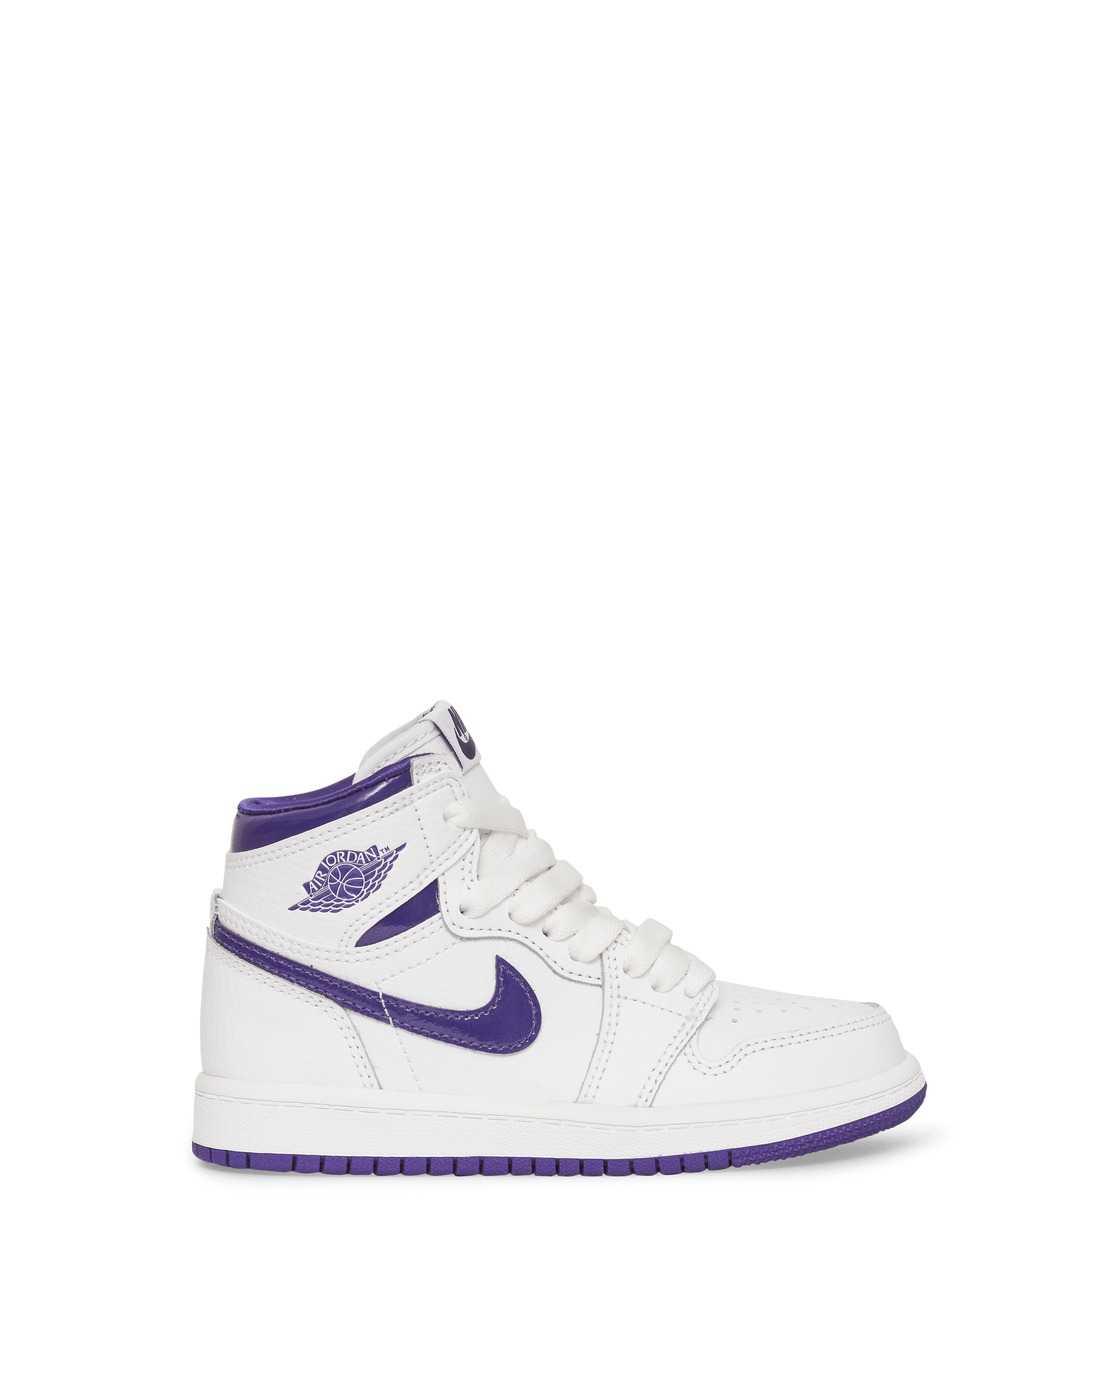 Photo: Nike Jordan Air Jordan 1 Retro Hi Og Ps Sneakers White/Court Purple